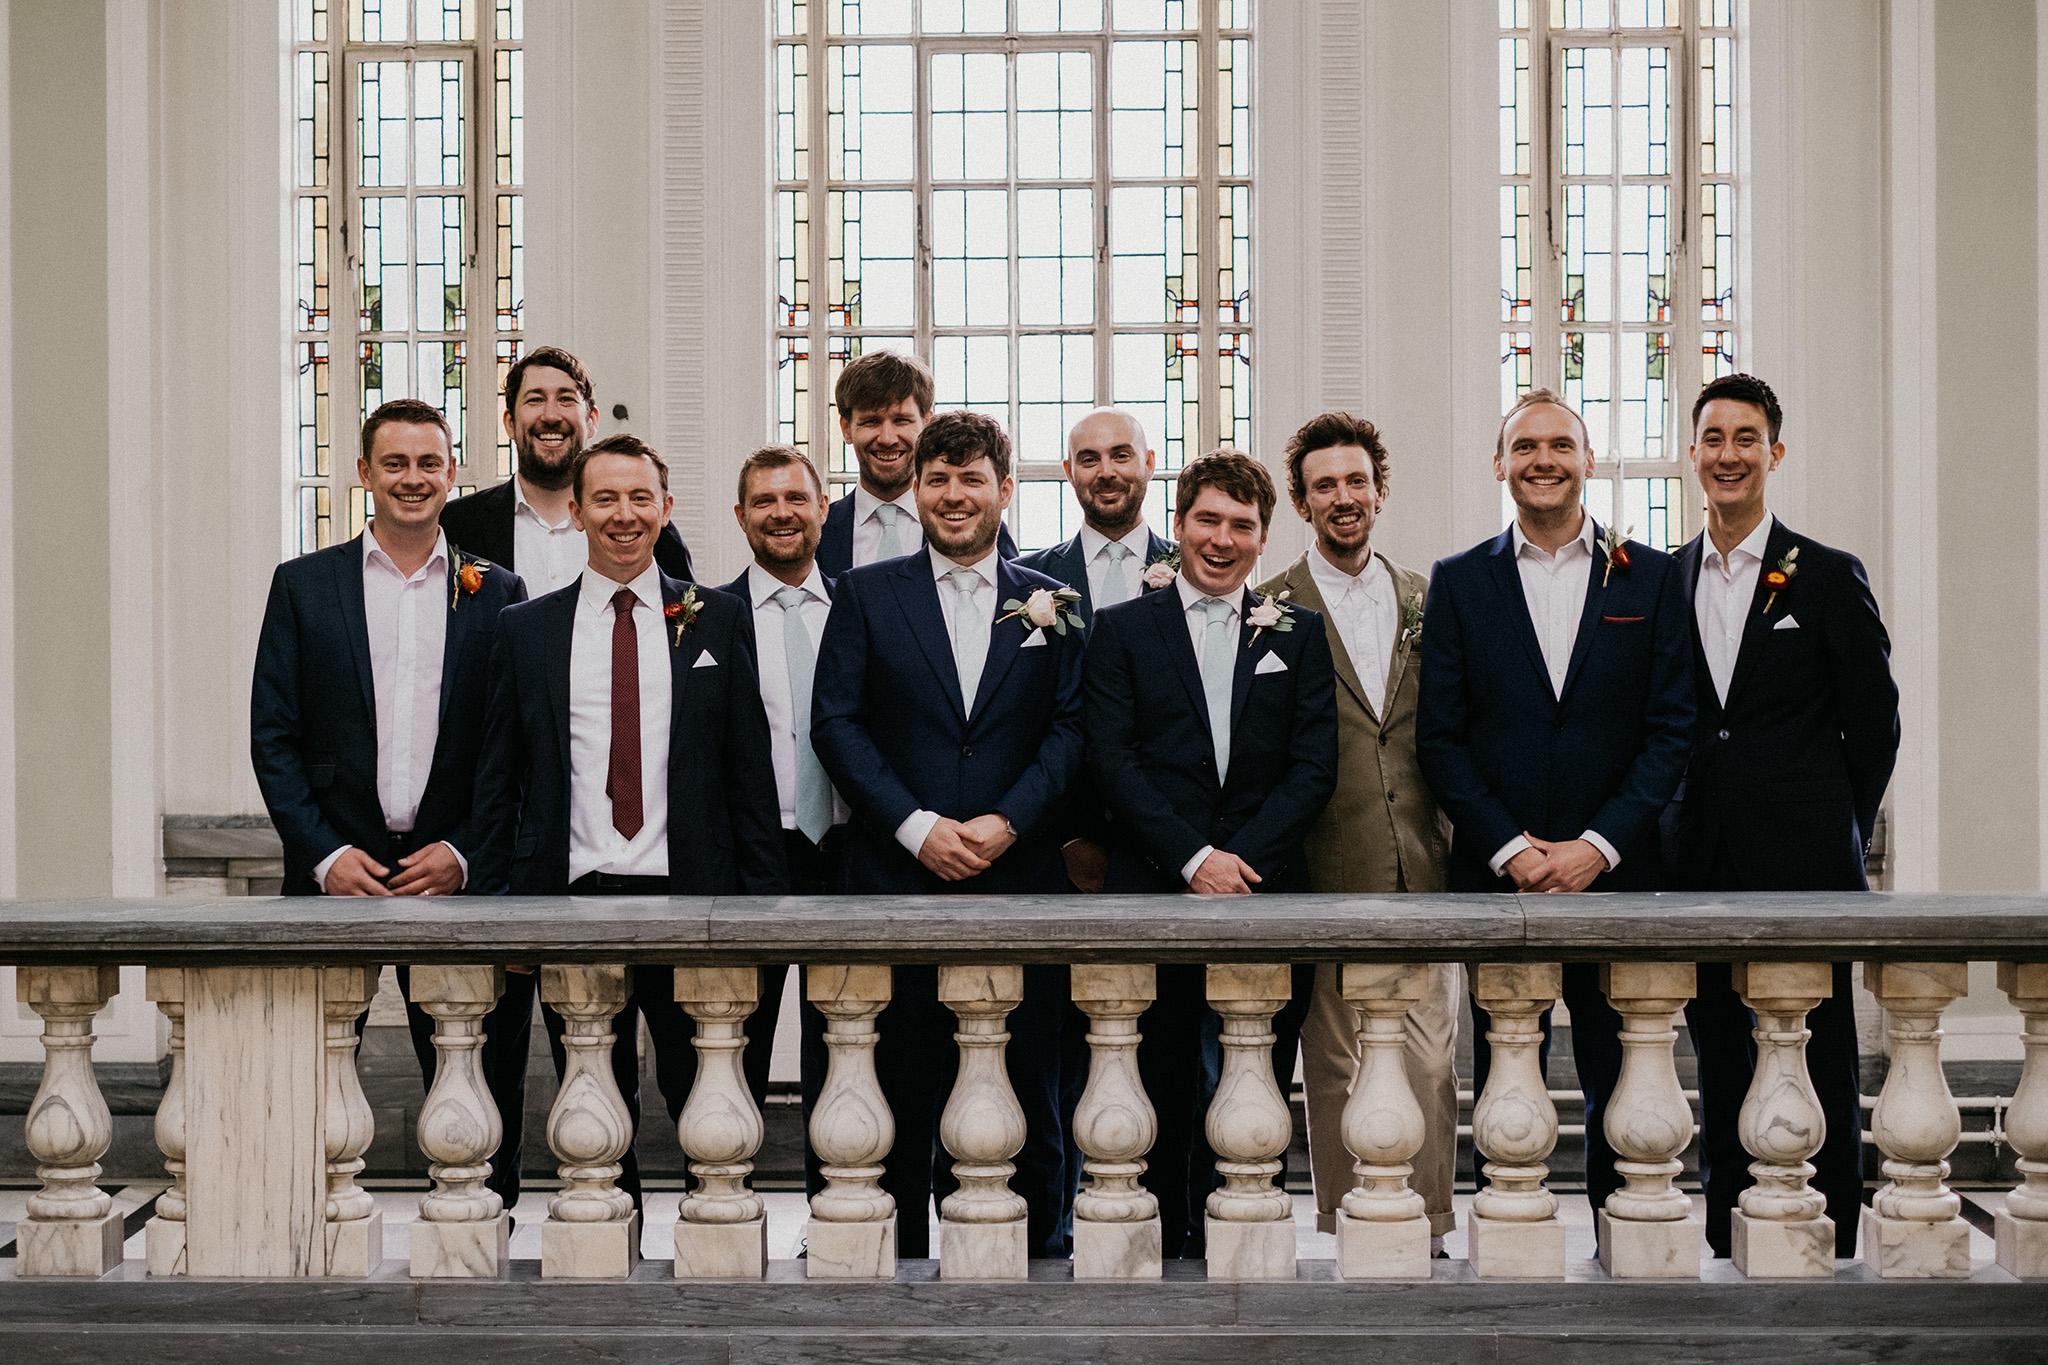 Islington-town-hall-wedding9.jpg